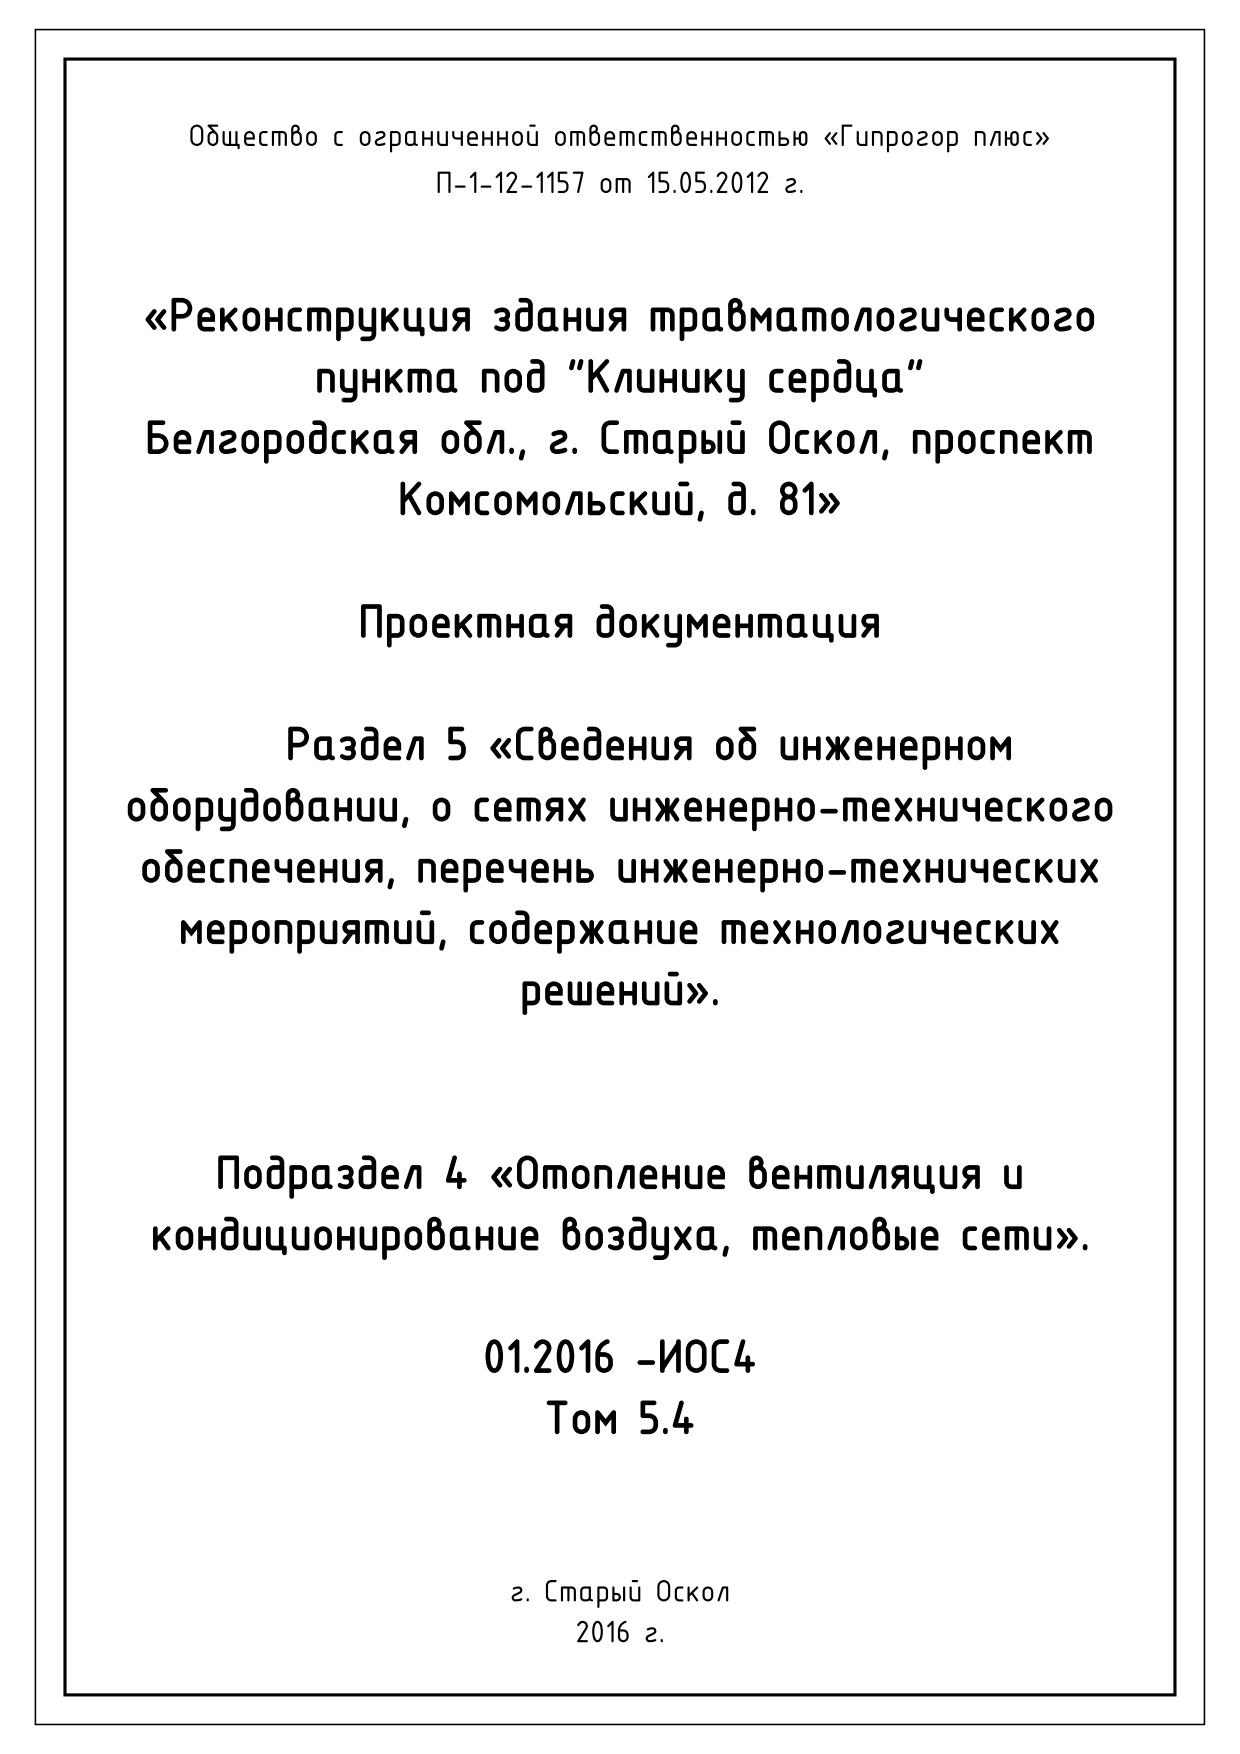 Депо 12-36-561